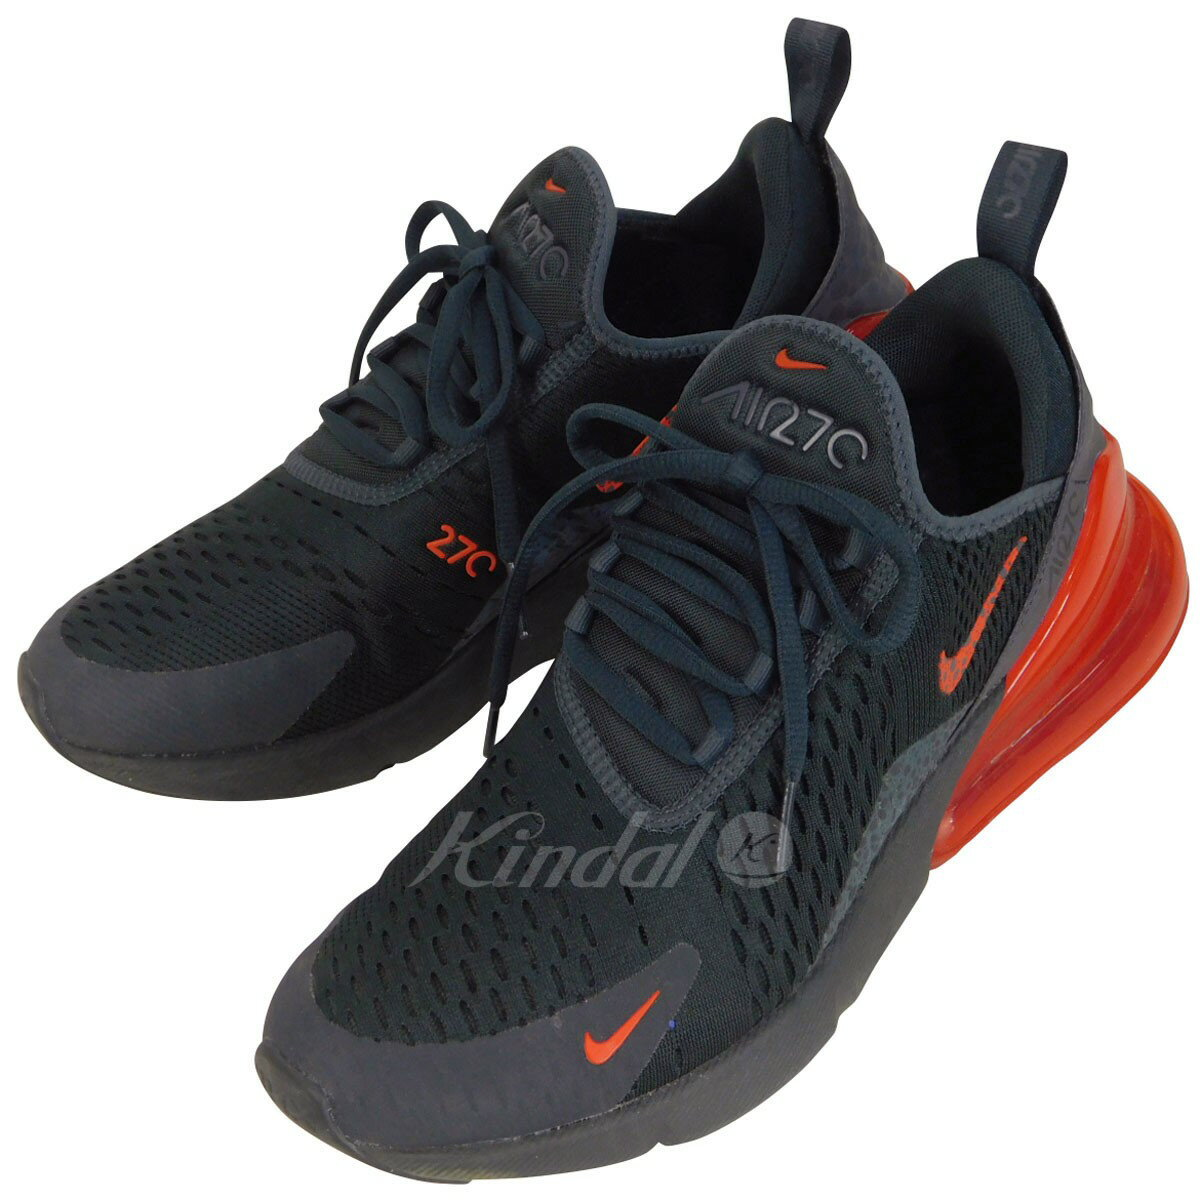 NIKE AIR MAX 270 SE REFLECTIVE BQ6525 001 sneakers black X red size: 26 5cm (Nike)